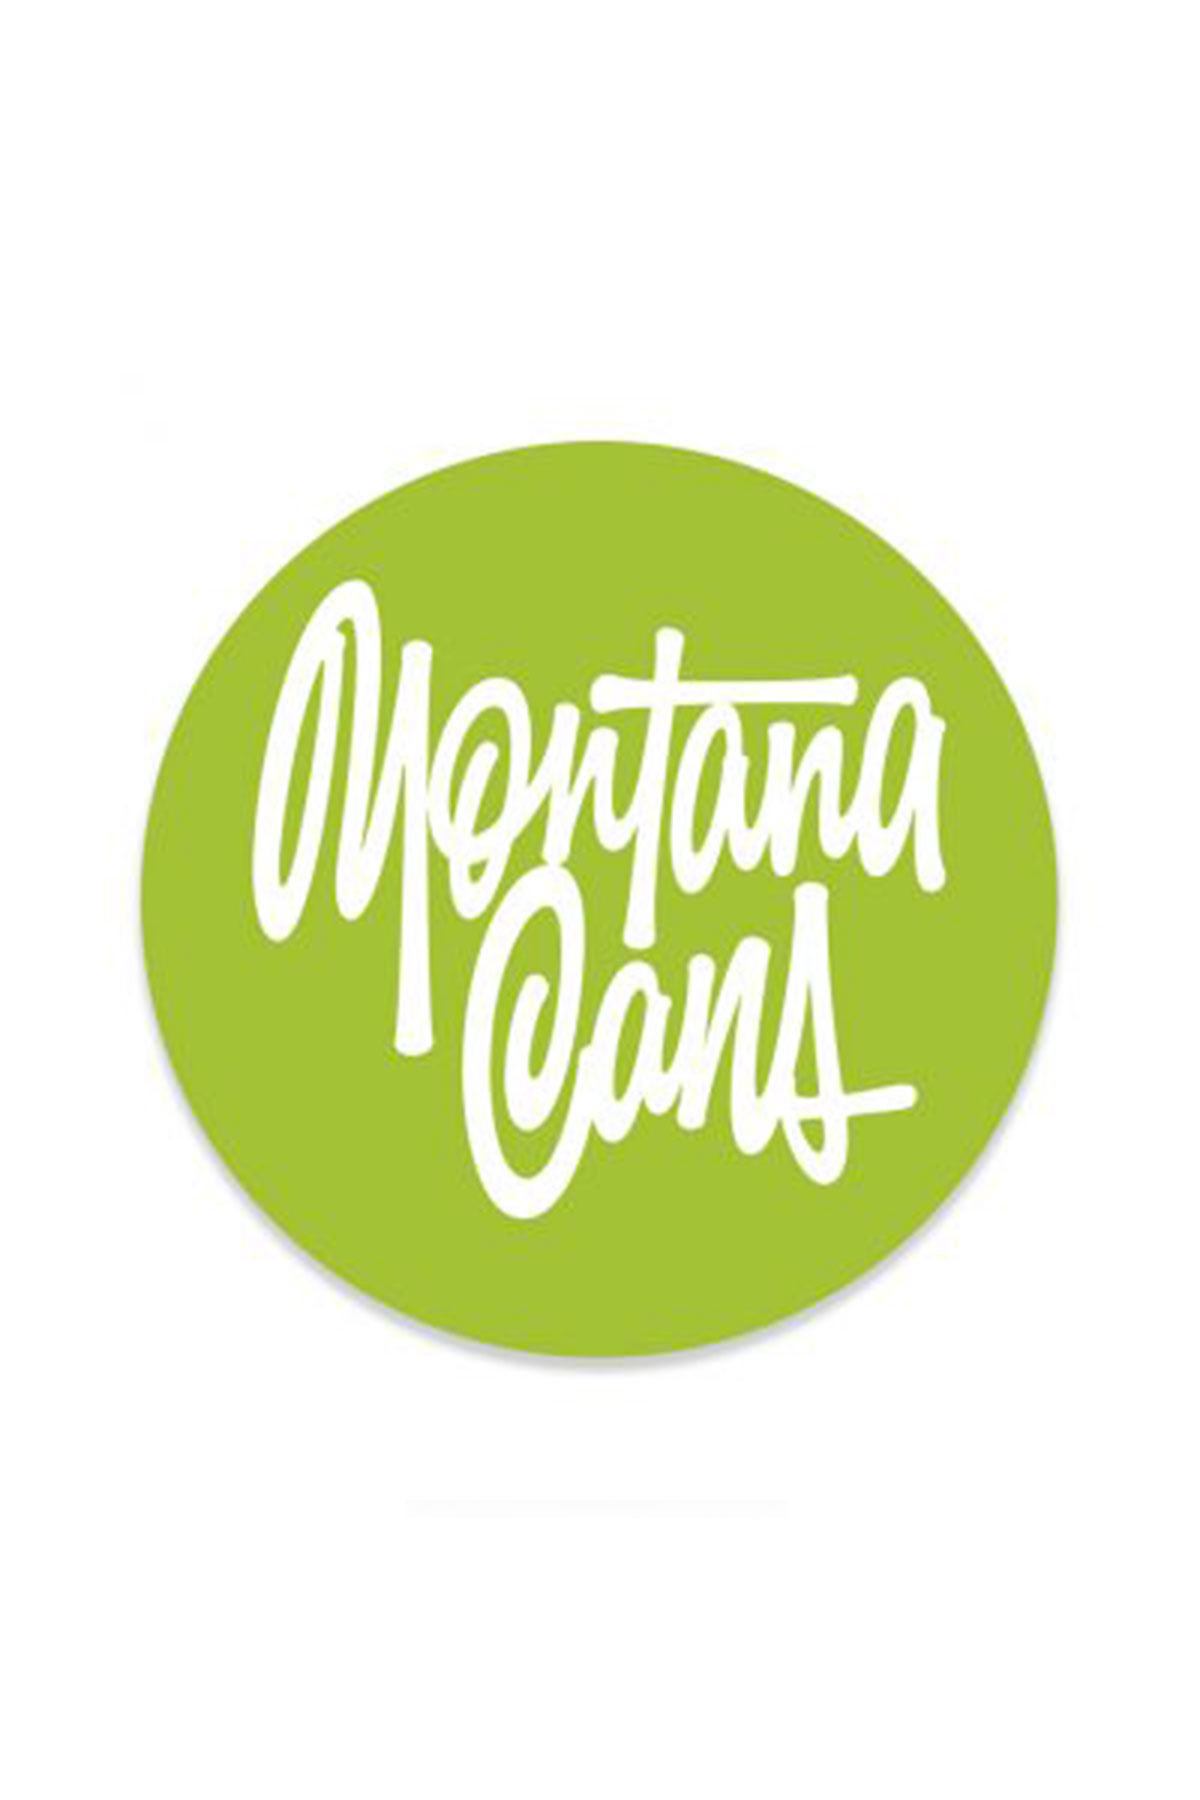 Montana sticker set